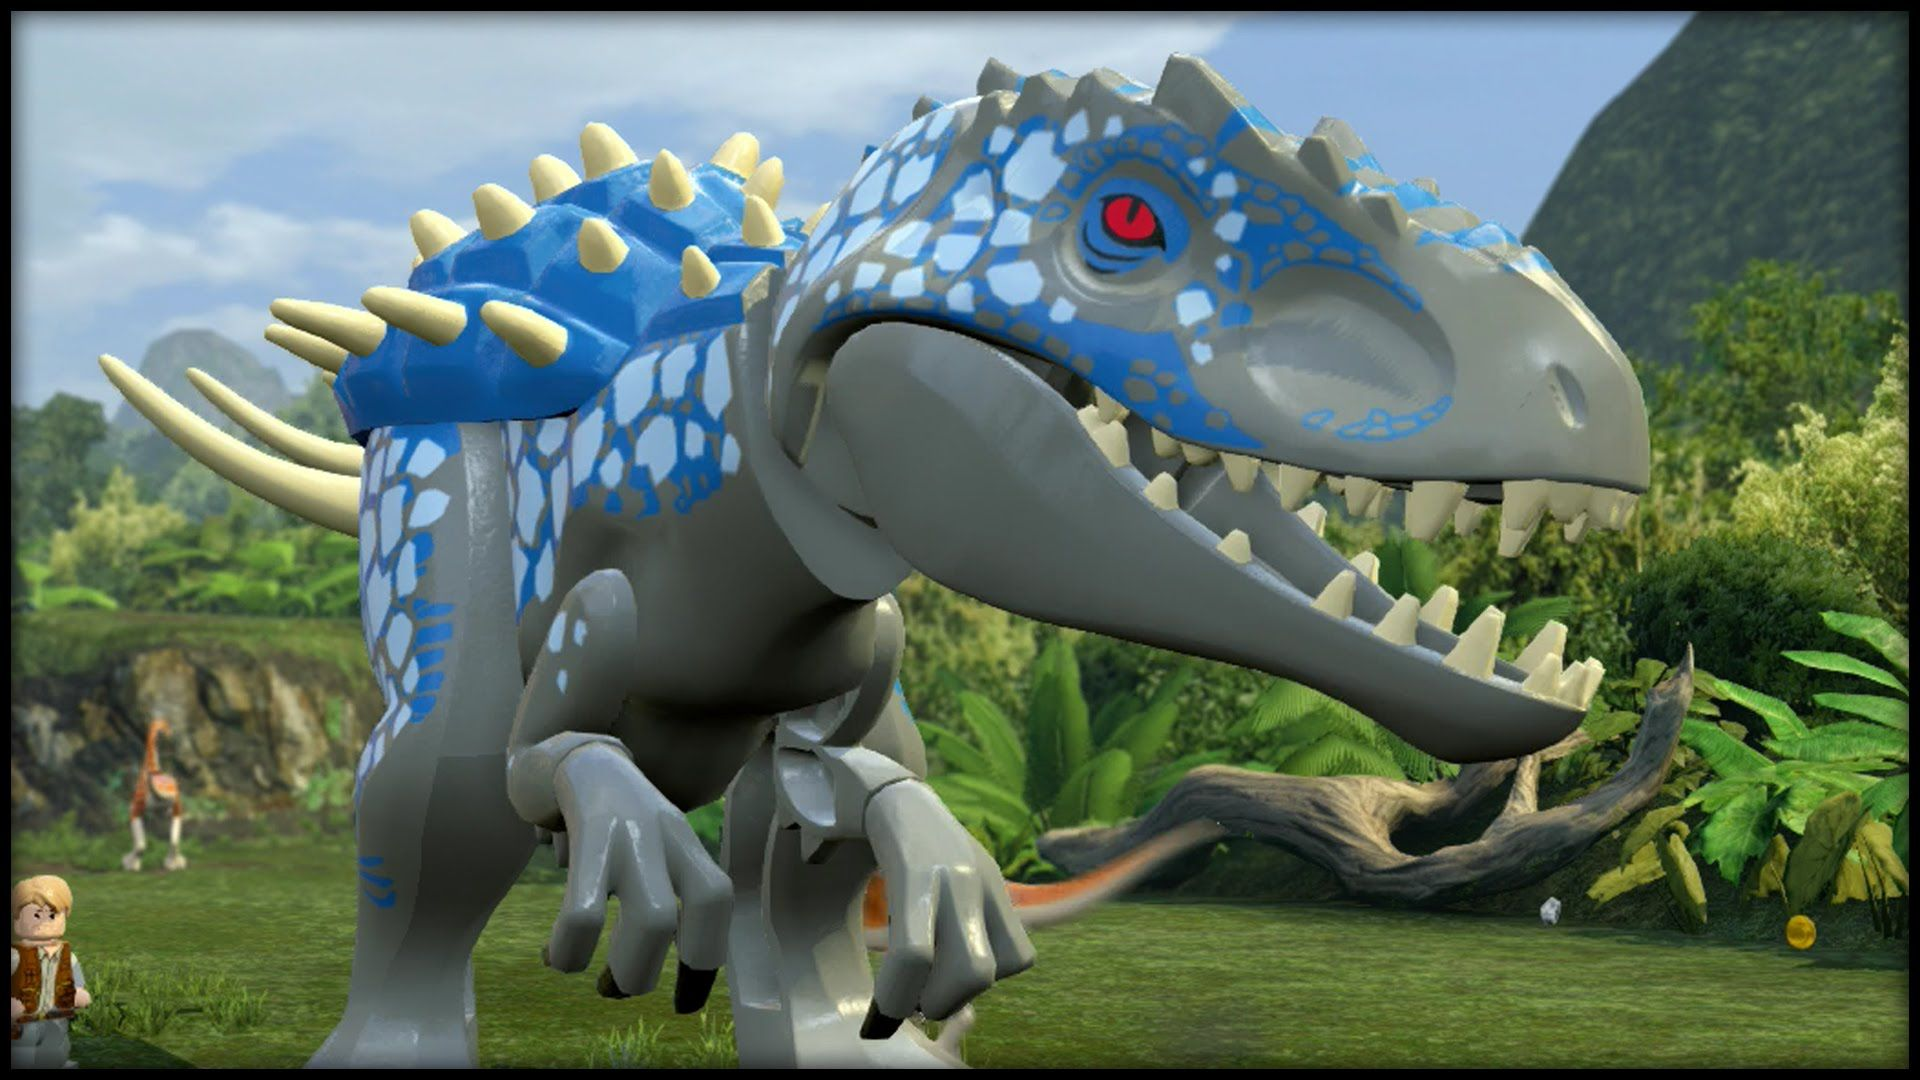 LEGO Jurassic World - DARKSEID T-REX!   LEGO JURASSIC WORLD ...